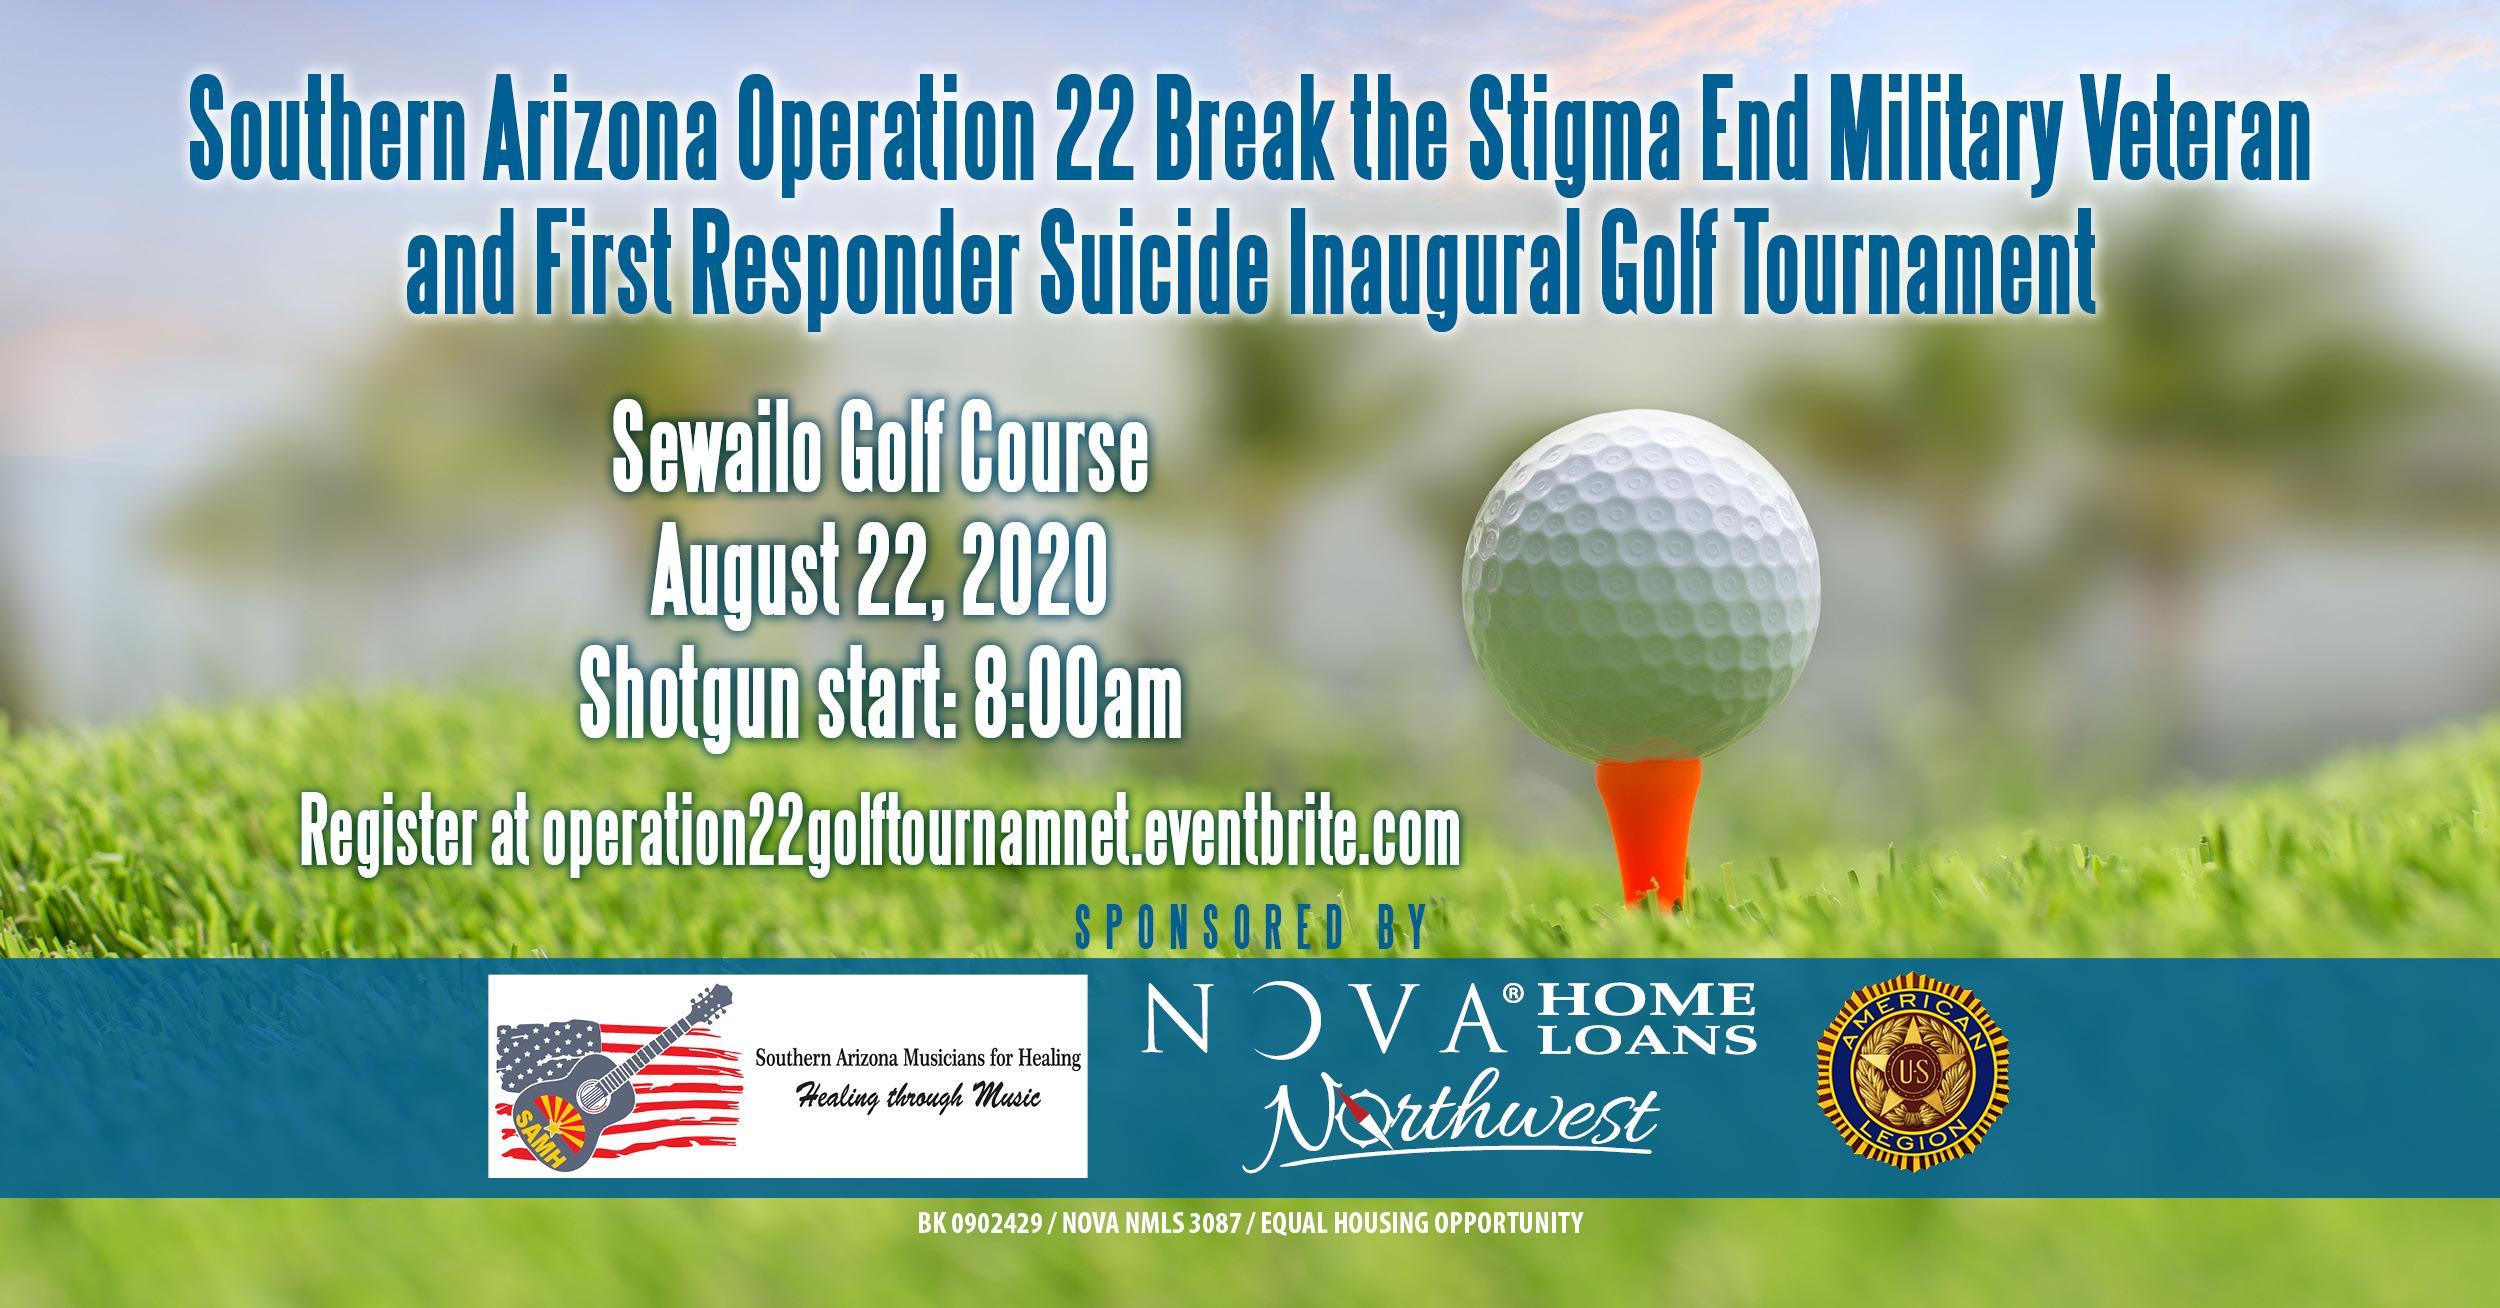 Southern Arizona Operation 22 Break the Stigma Inaugural Golf Tournament